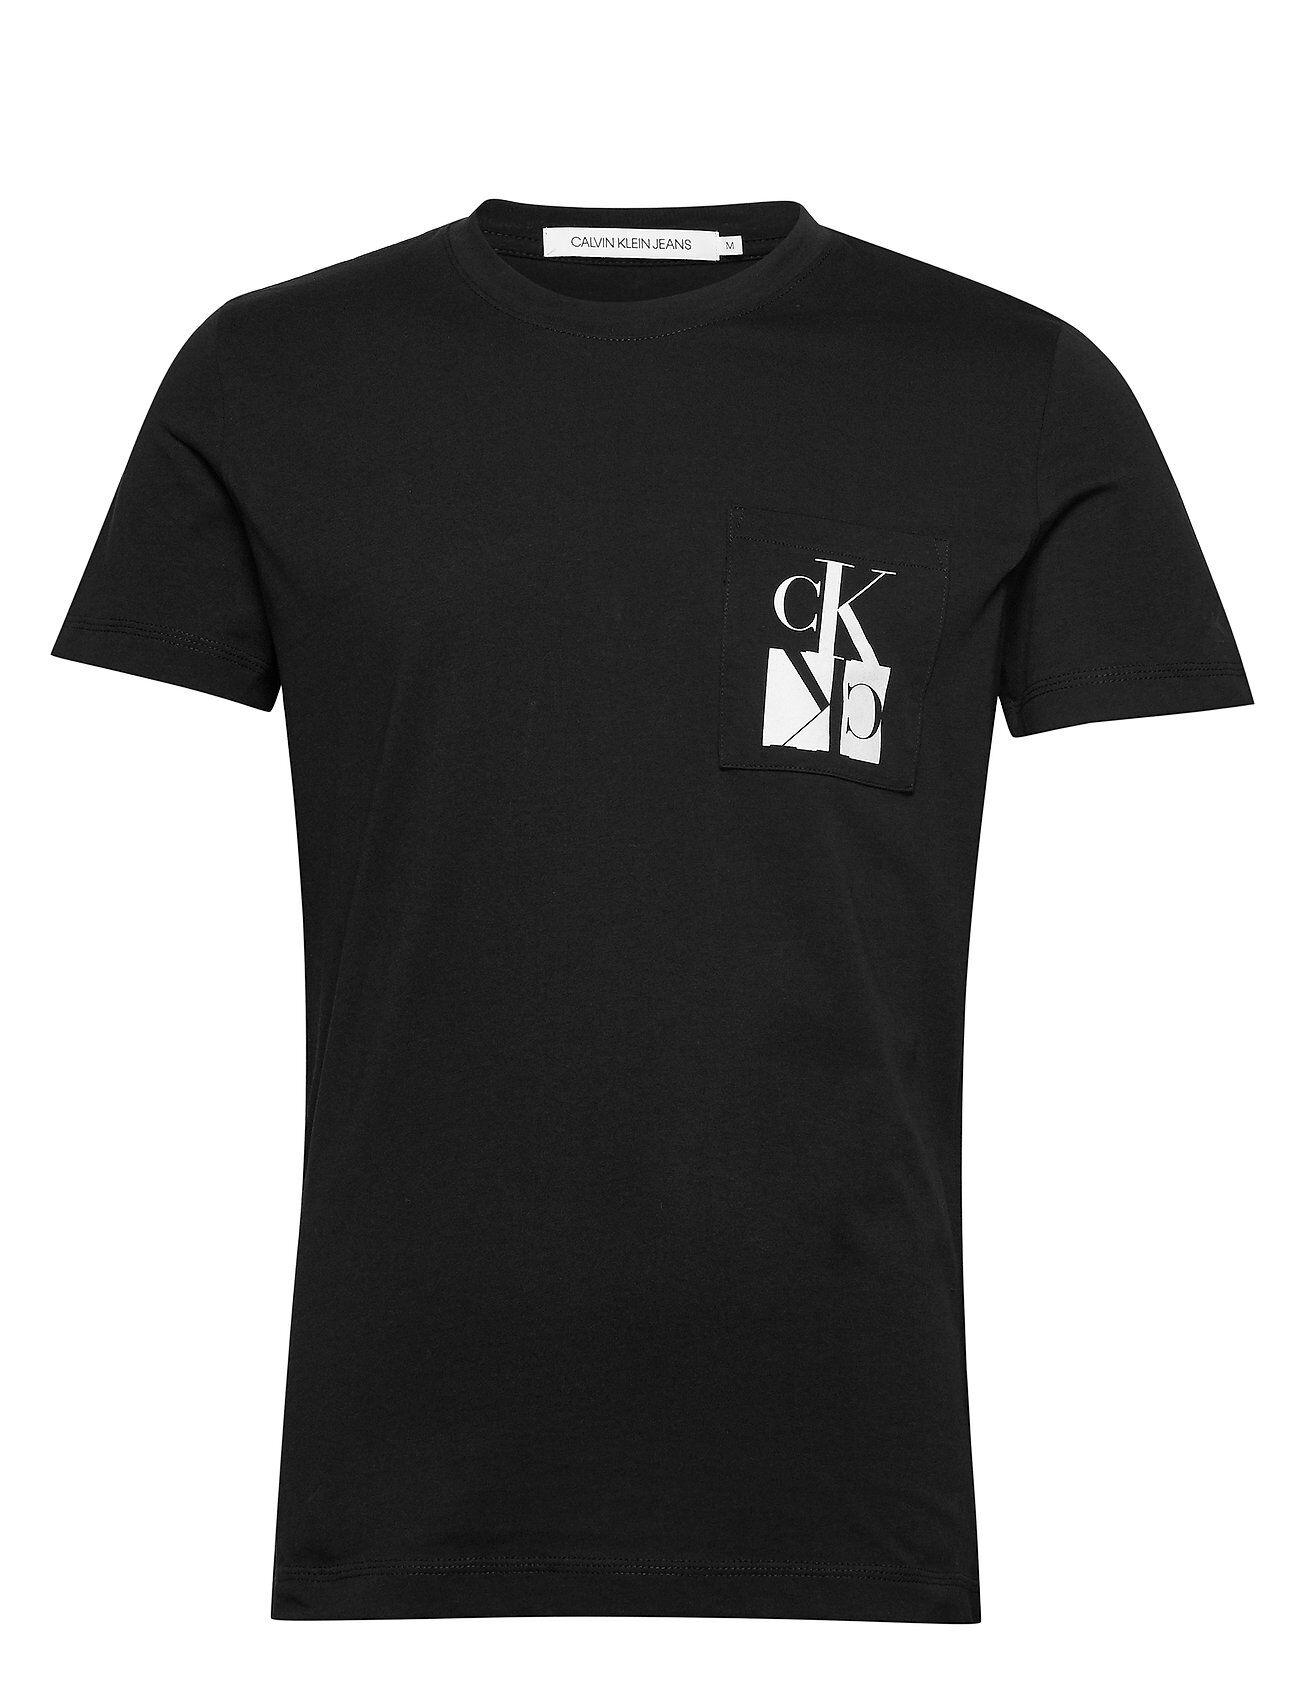 Image of Calvin Mirrored Monogram Pkt Slim Tee T-shirts Short-sleeved Musta Calvin Klein Jeans